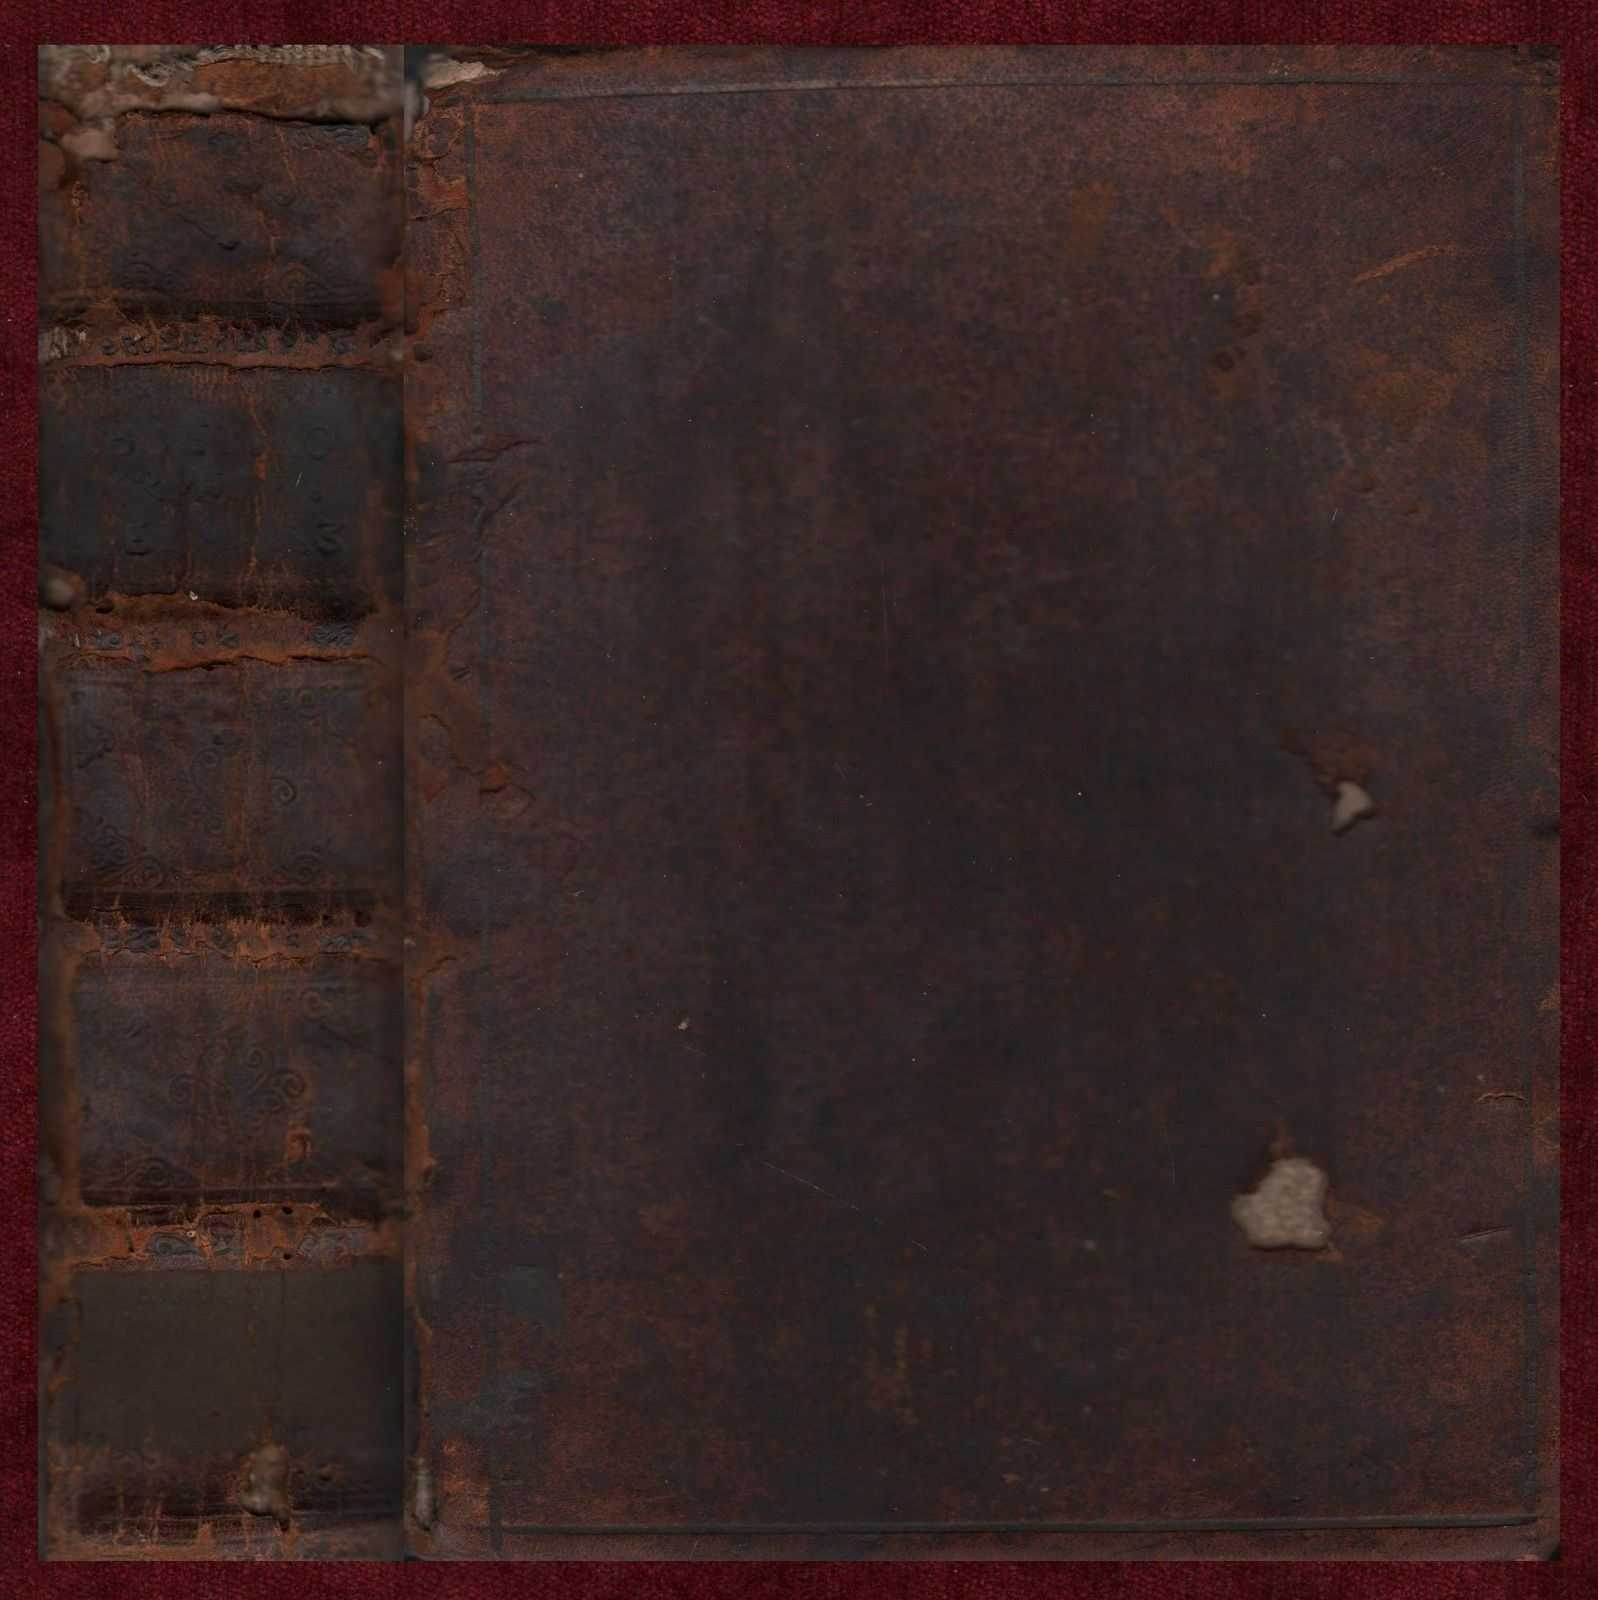 1688-Boethius-TRIUMPH-LEUCHTENDEN-KRIEGS-HELMS-Vol-3-History-Christian-Ottoman-401133054023-3